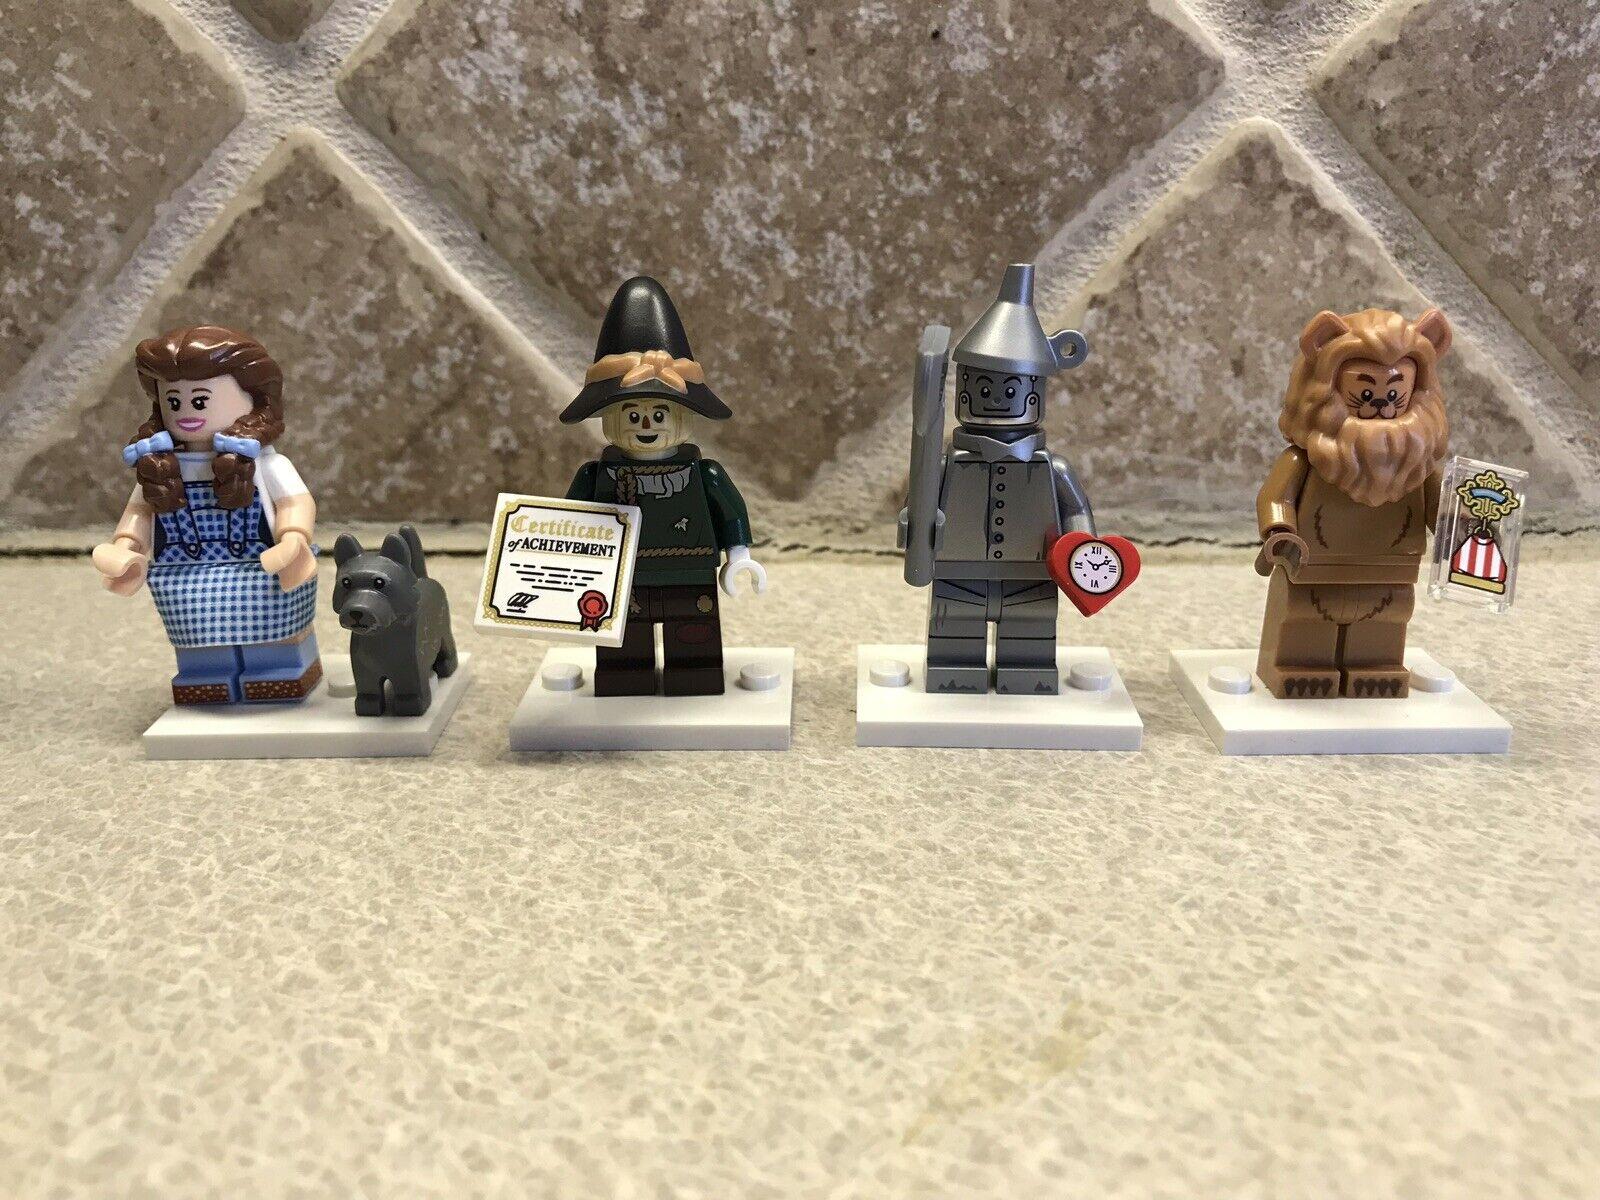 Lego Movie 2 Minifigures Minifigures Minifigures 71023 Wizard of Oz Set 4 DgoldTHY SCARECROW LION TIN MAN 98d590